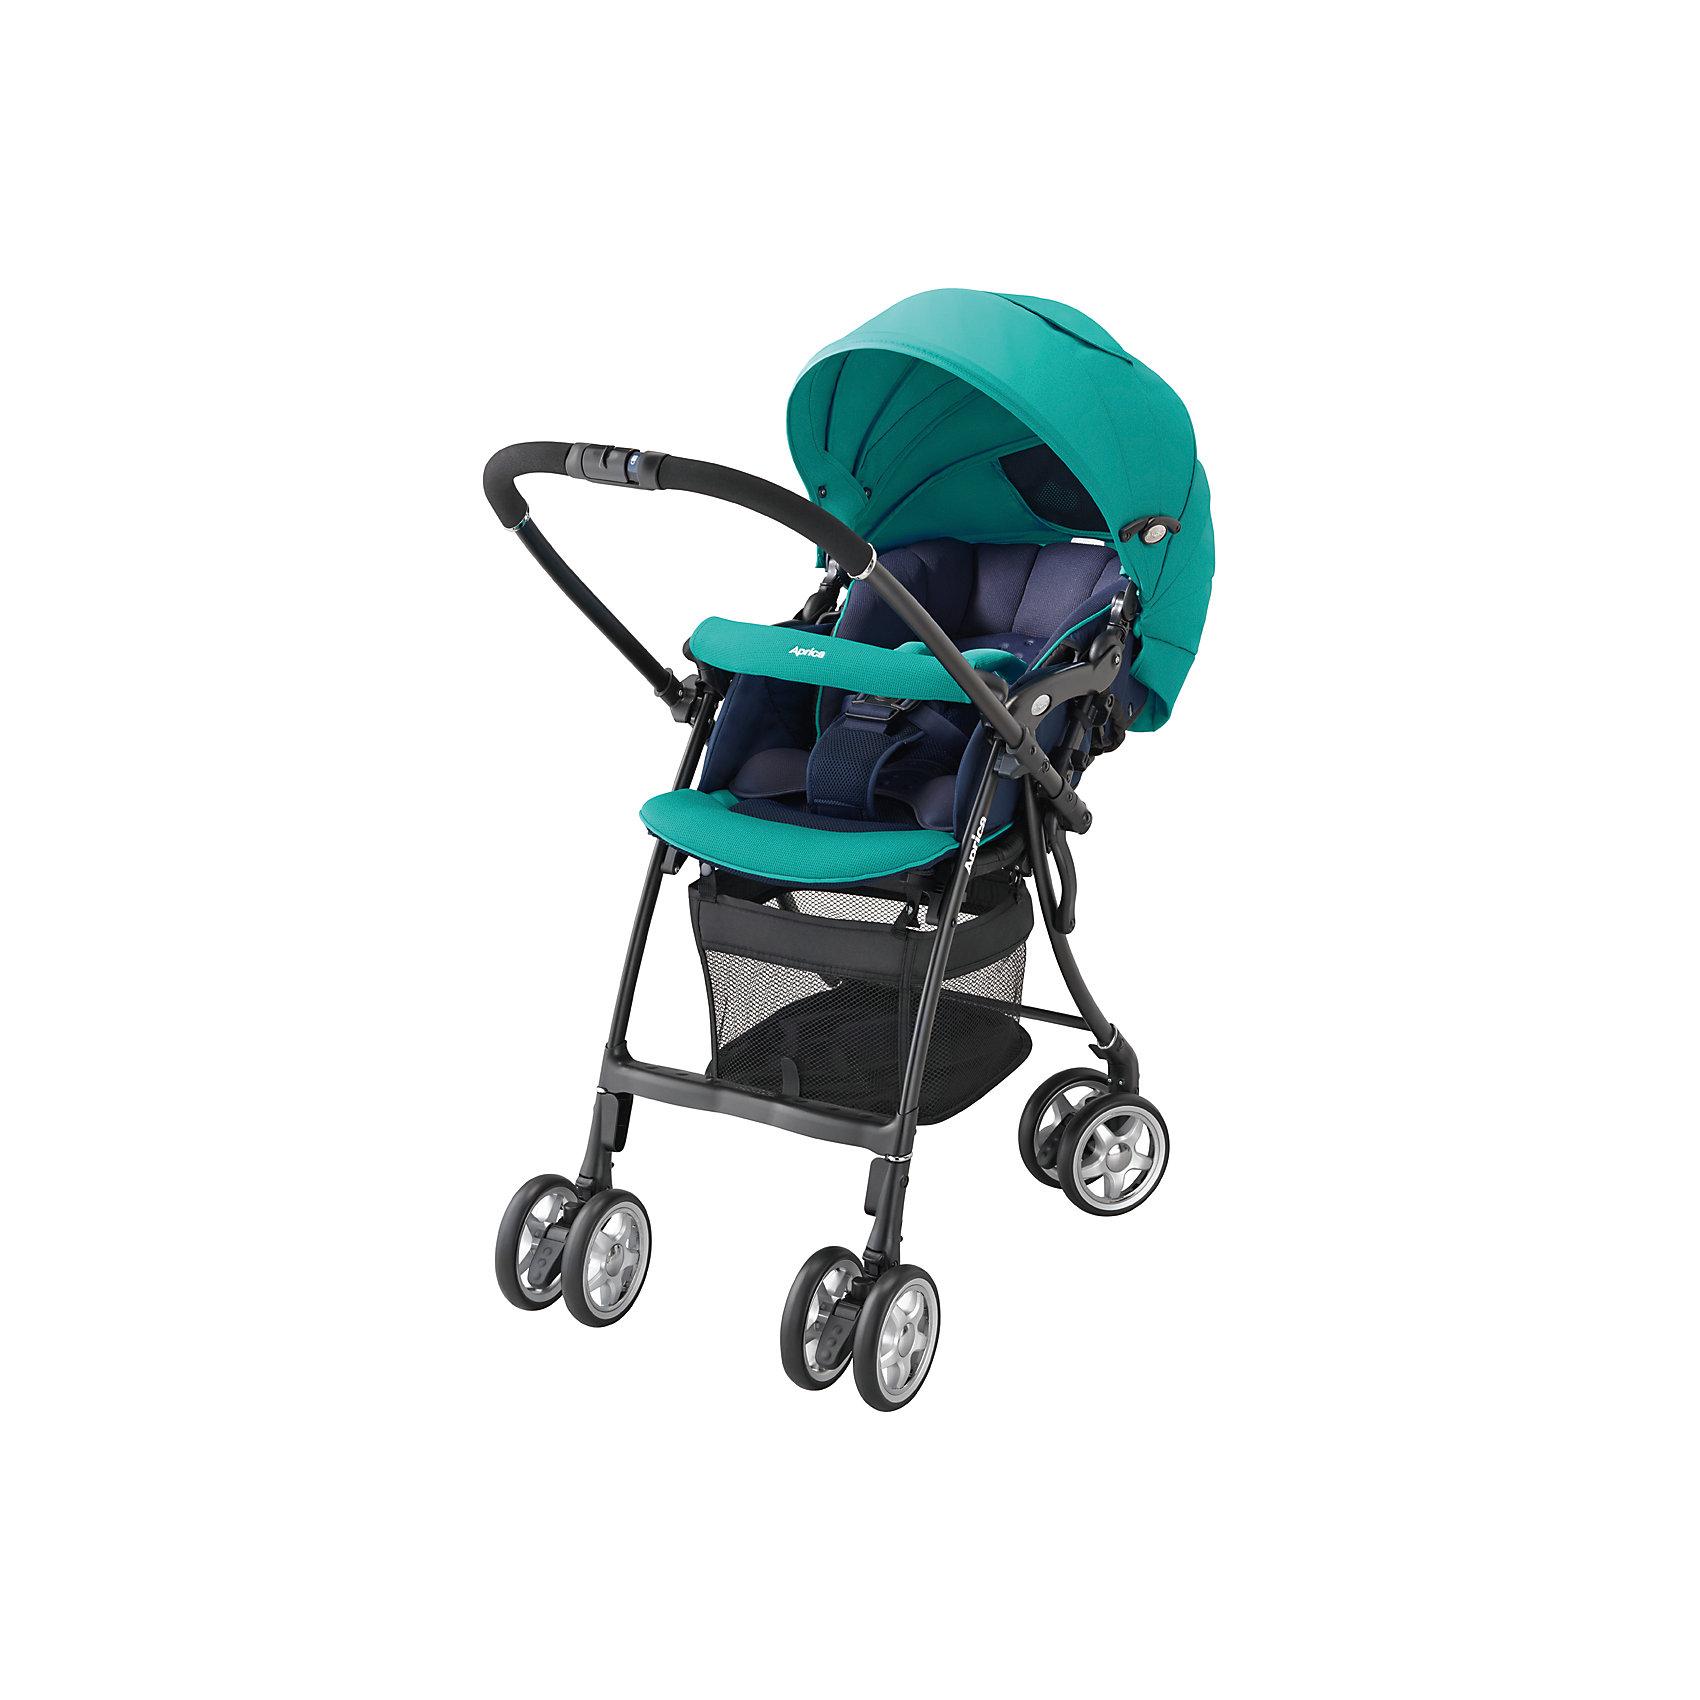 Aprica Прогулочная коляска Air Ria Lux, Aprica, /синий прогулочные коляски aprica magical air